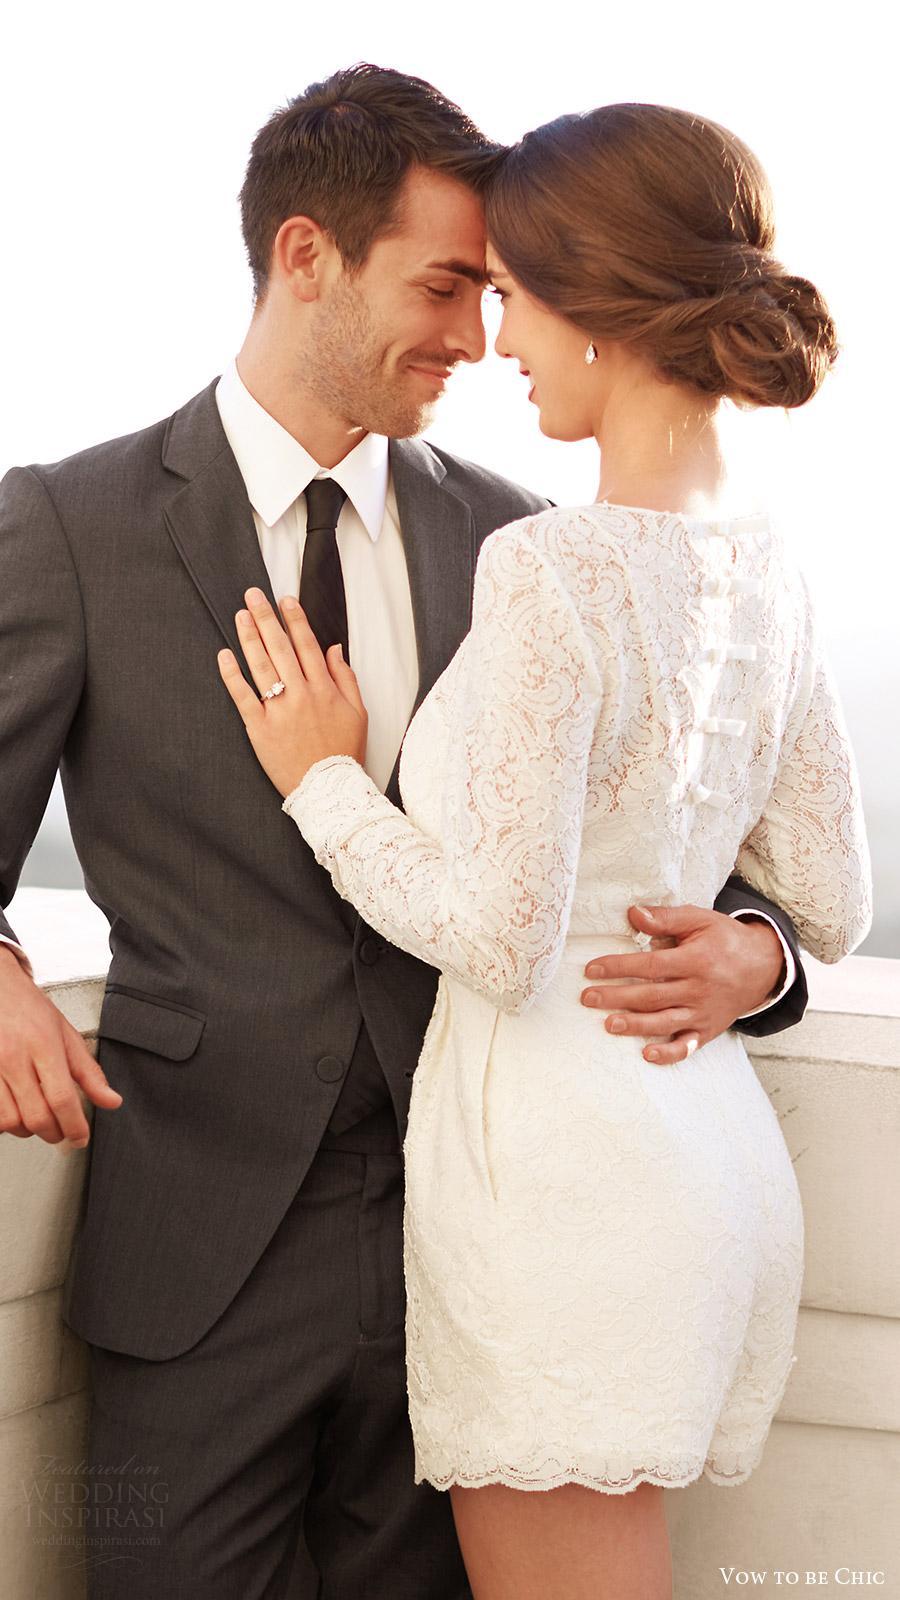 vow to be chic 2016 encore watters prato lace wedding romper suit